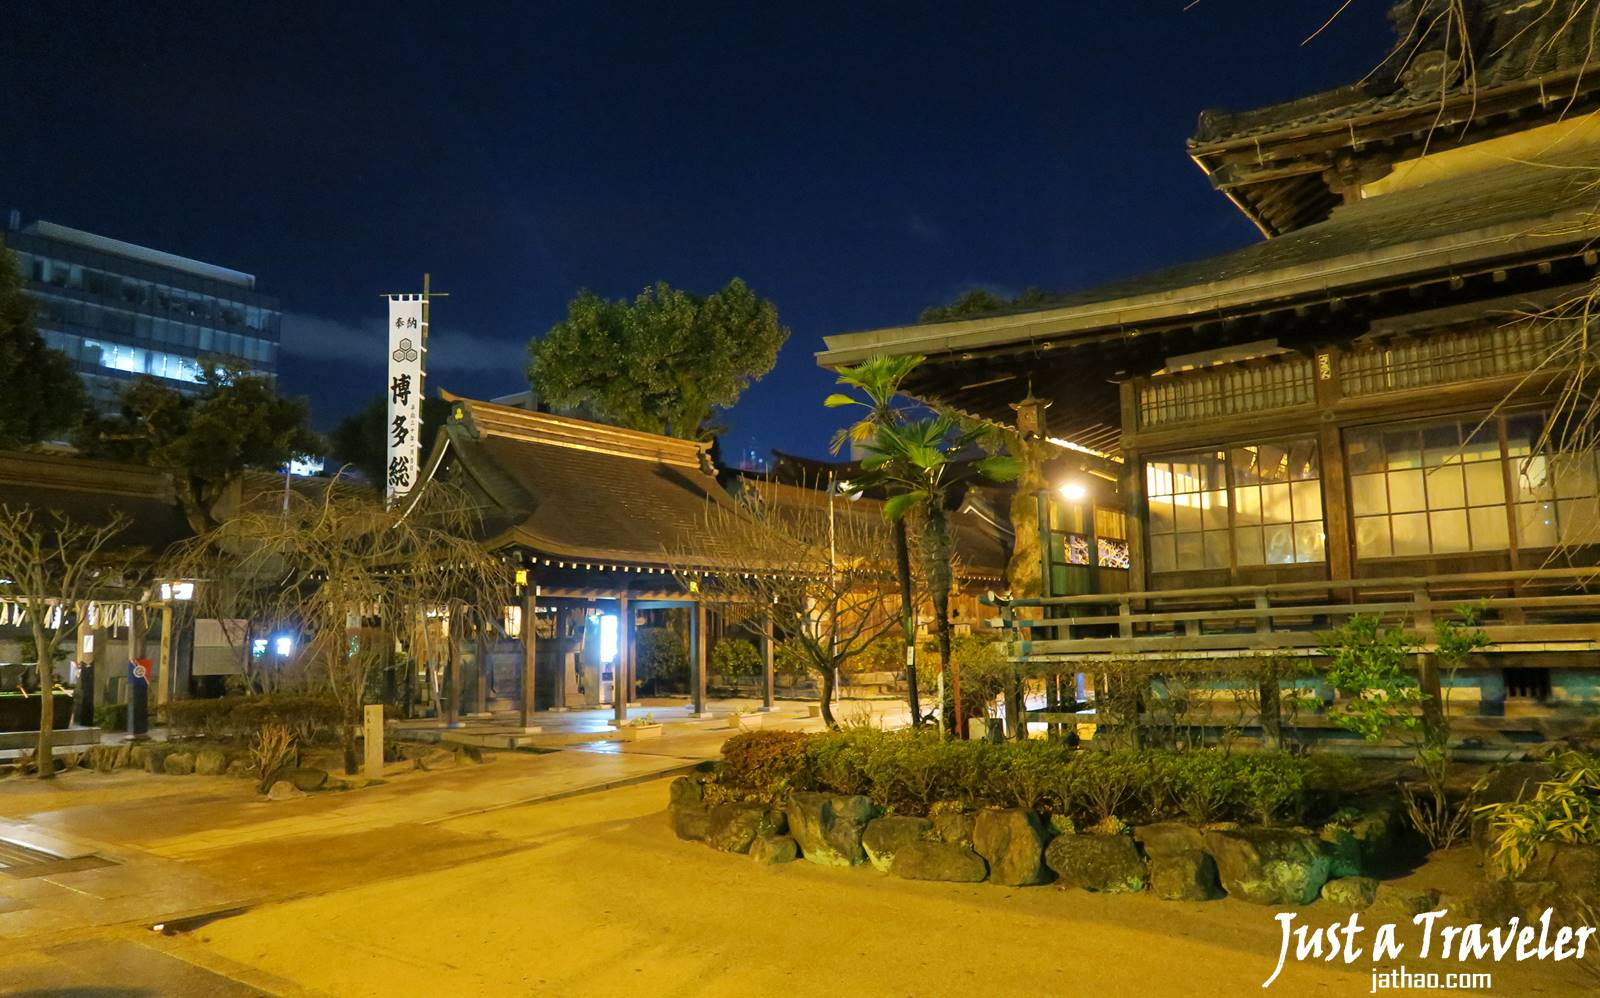 福岡-景點-推薦-櫛田神社-福岡好玩景點-福岡必玩景點-福岡必去景點-福岡自由行景點-攻略-市區-郊區-旅遊-行程-Fukuoka-Tourist-Attraction